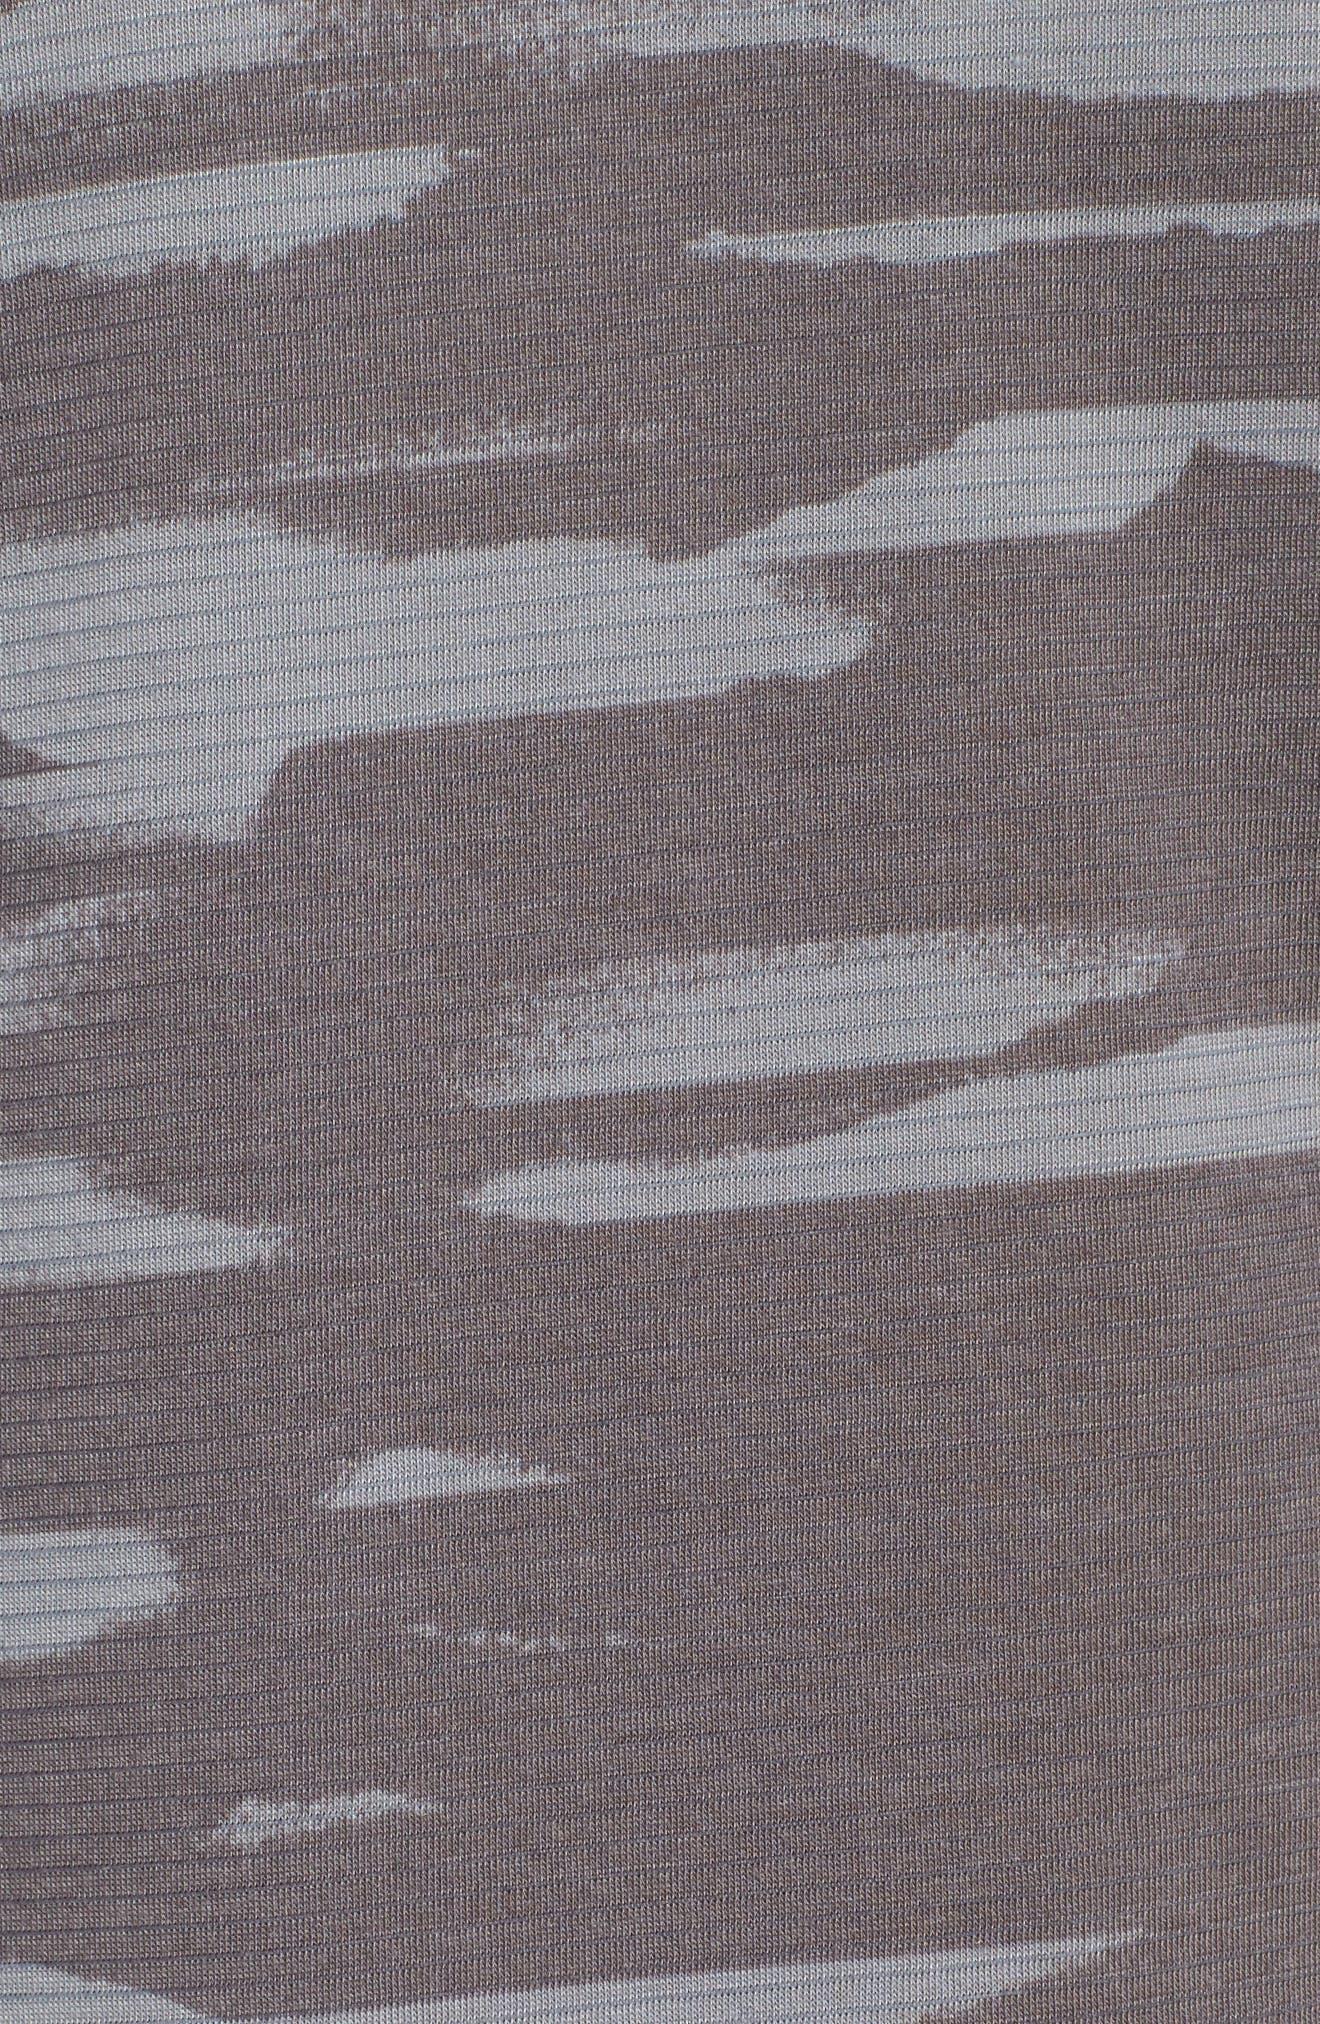 Threadborne Mesh Running T-Shirt,                             Alternate thumbnail 5, color,                             Grey / Black / Reflective